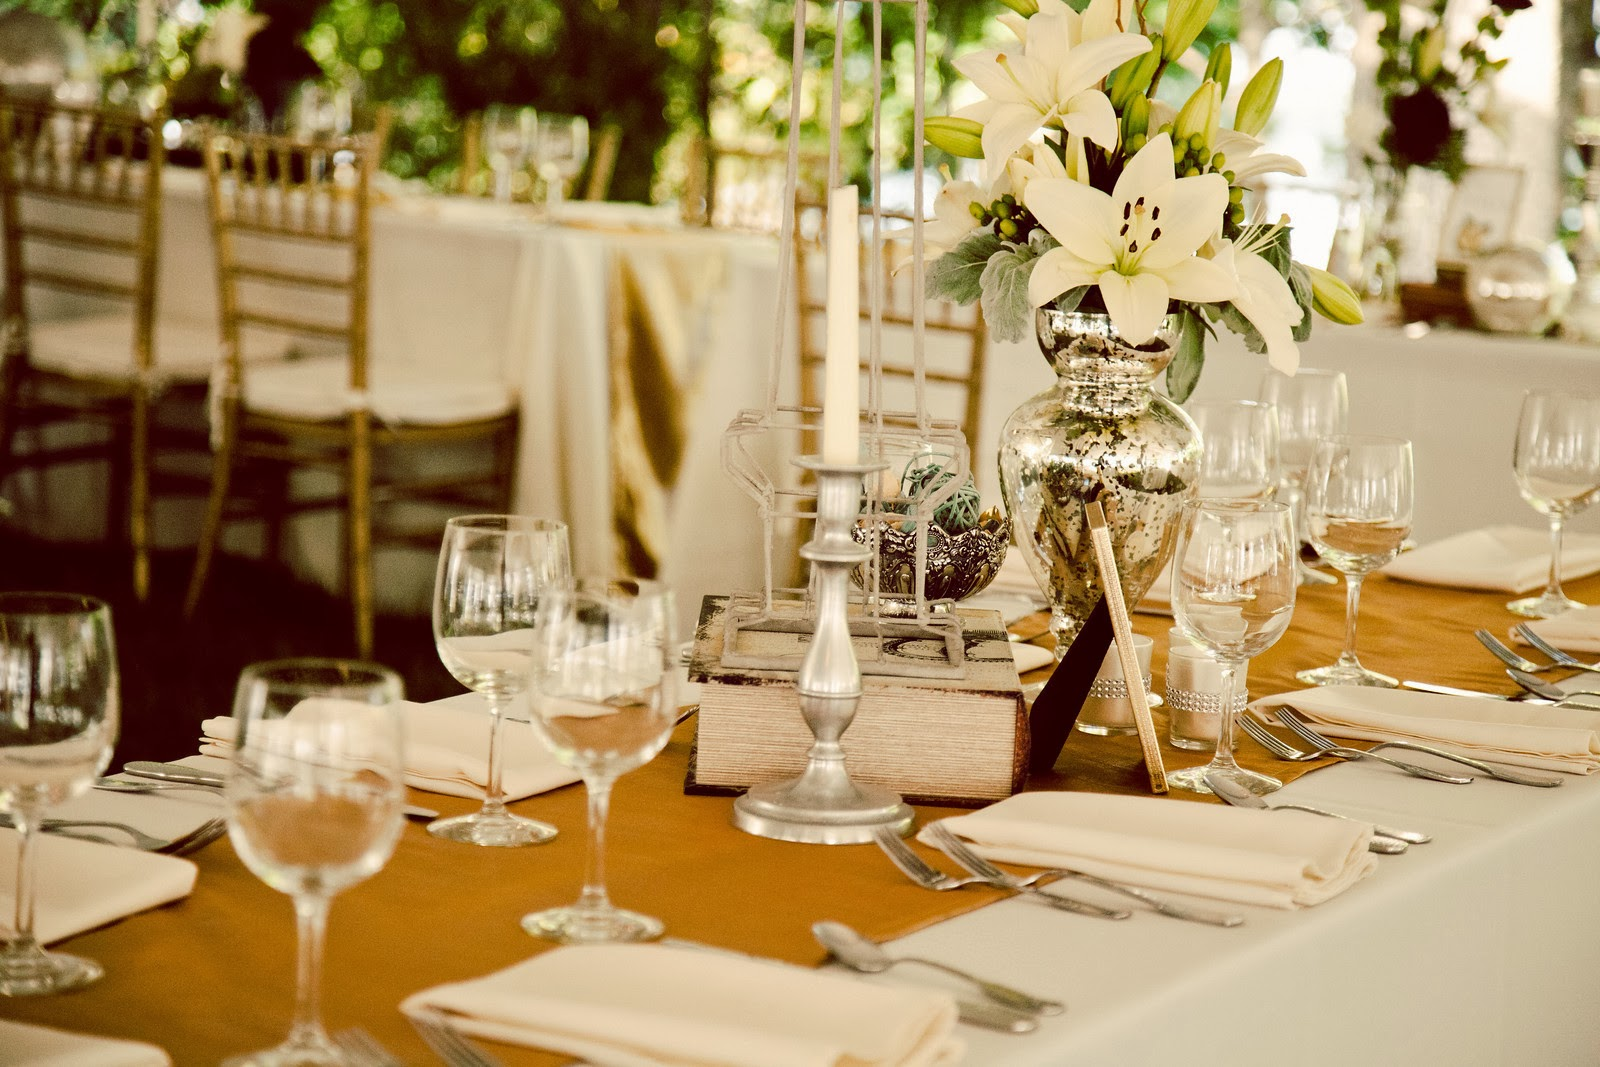 Superb Used Wedding Decor Ontario Images Wedding Decoration Ideas Second Hand  Wedding Decor Gallery Wedding Decoration Ideas